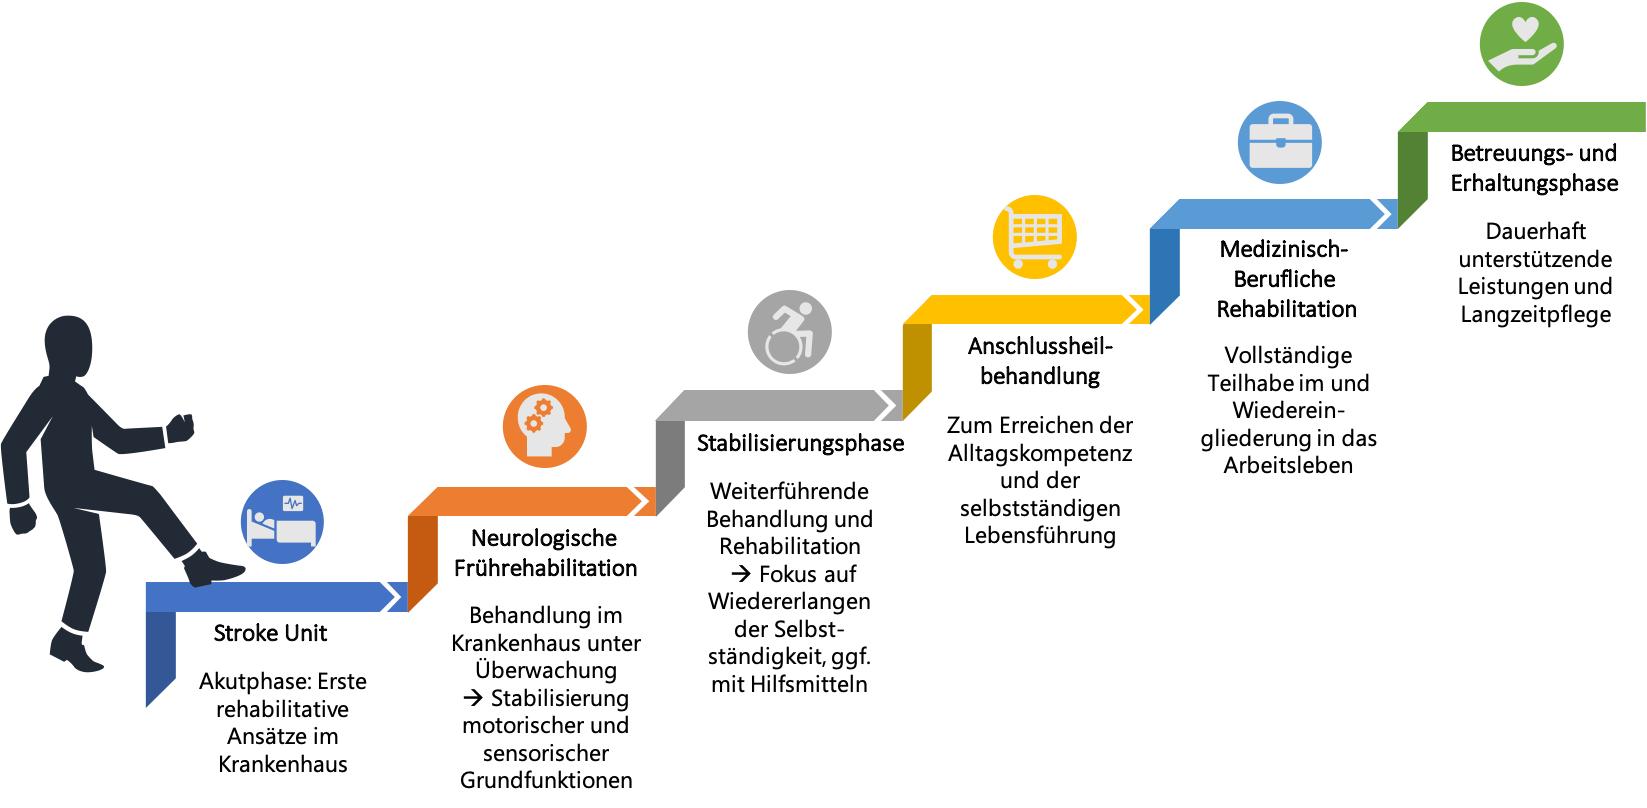 Phasenmodell der neurologischen Rehabilitation